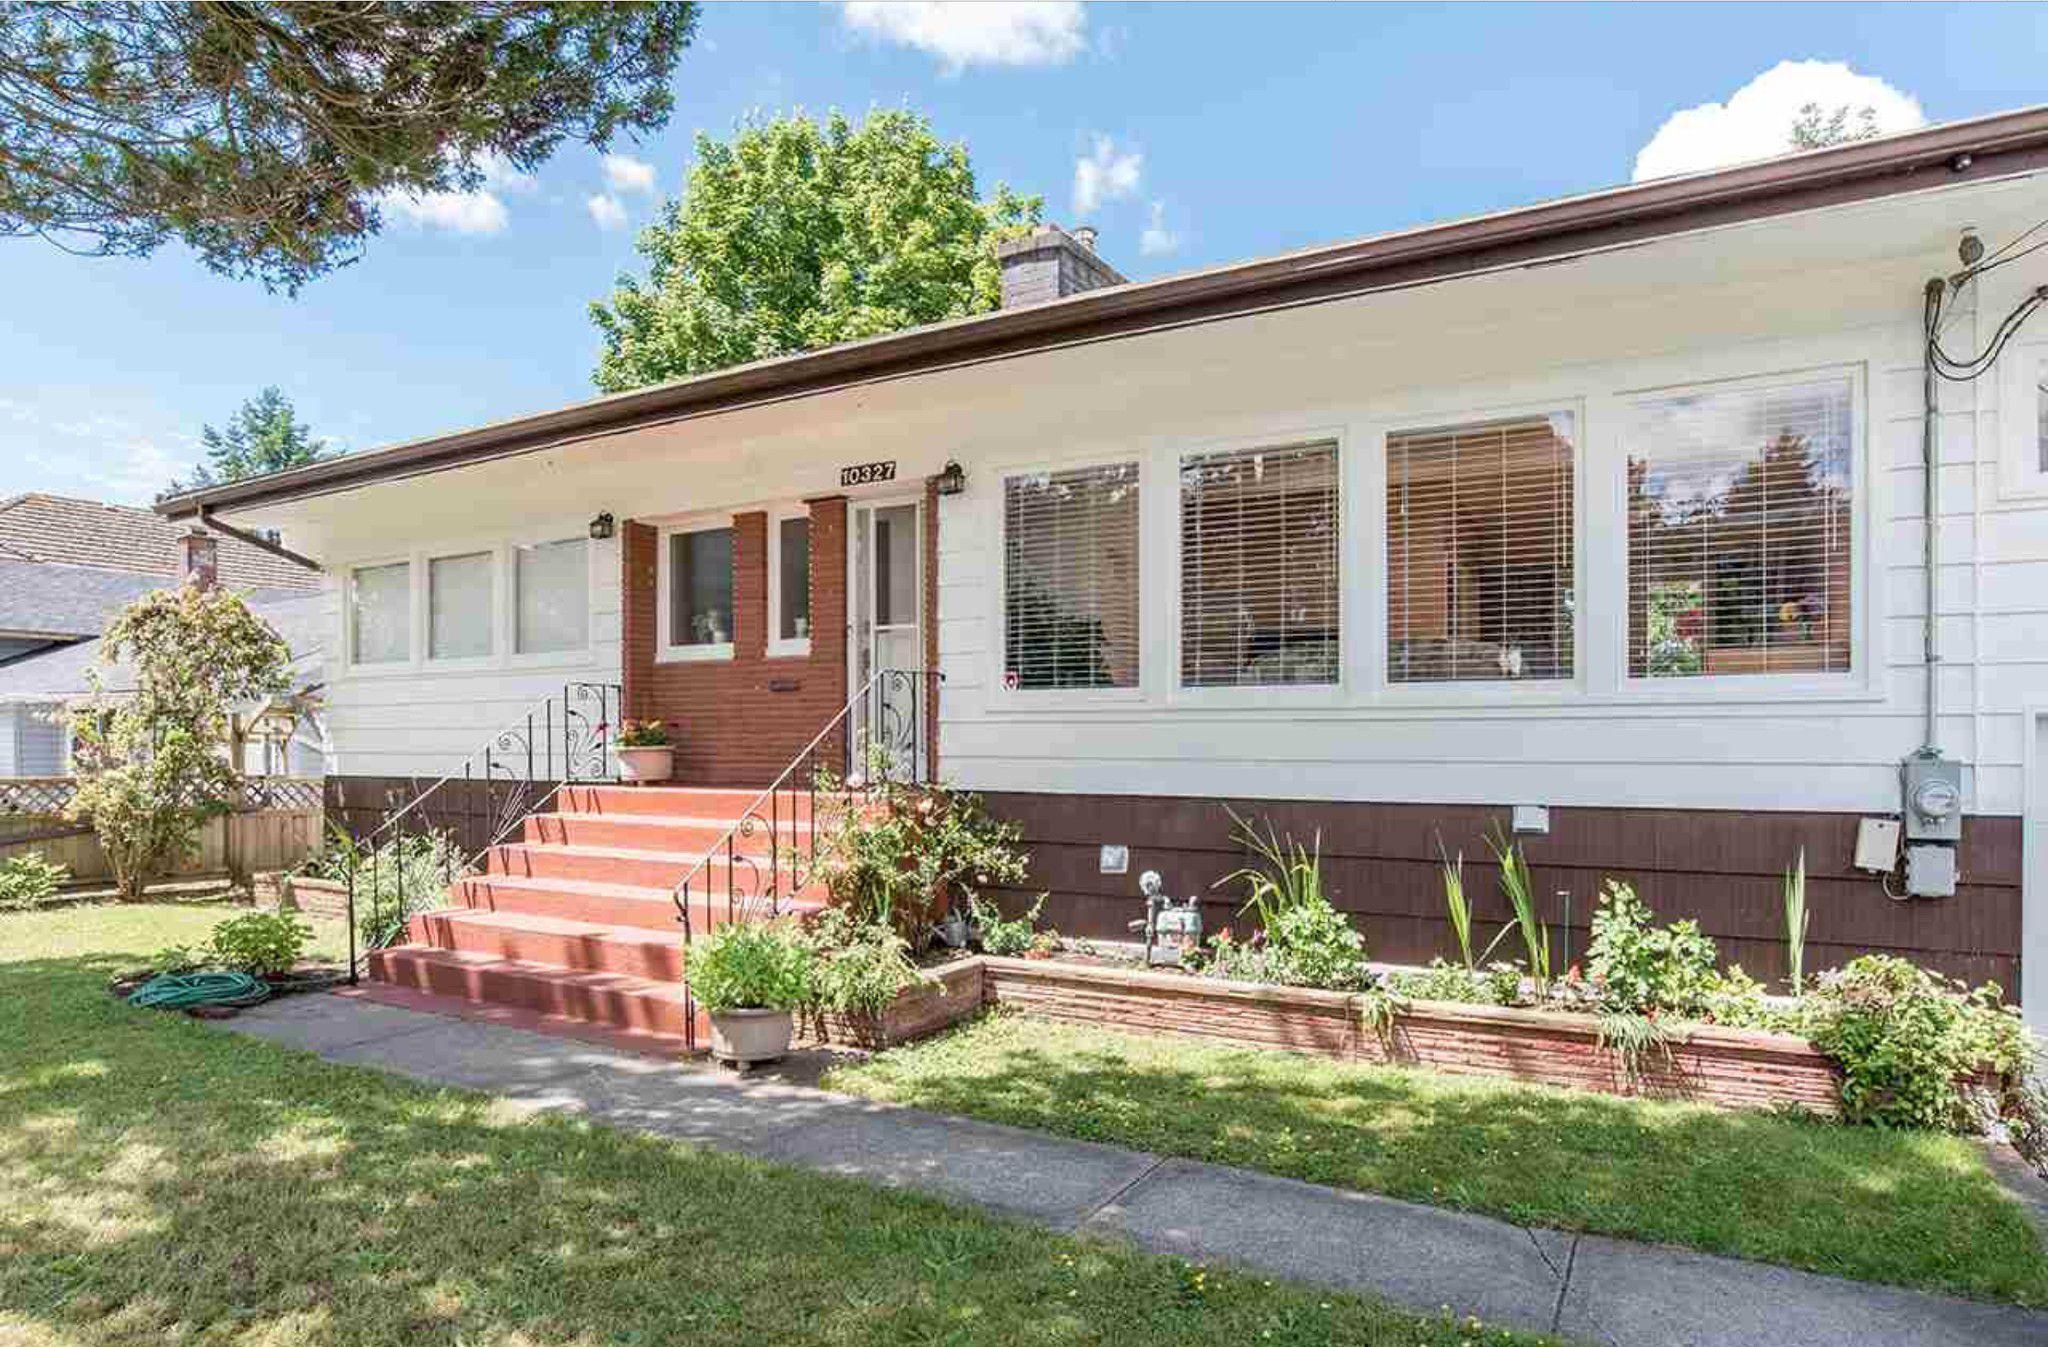 Photo 2: Photos: 10327 127A Street in Surrey: Cedar Hills House for sale : MLS®# R2178137